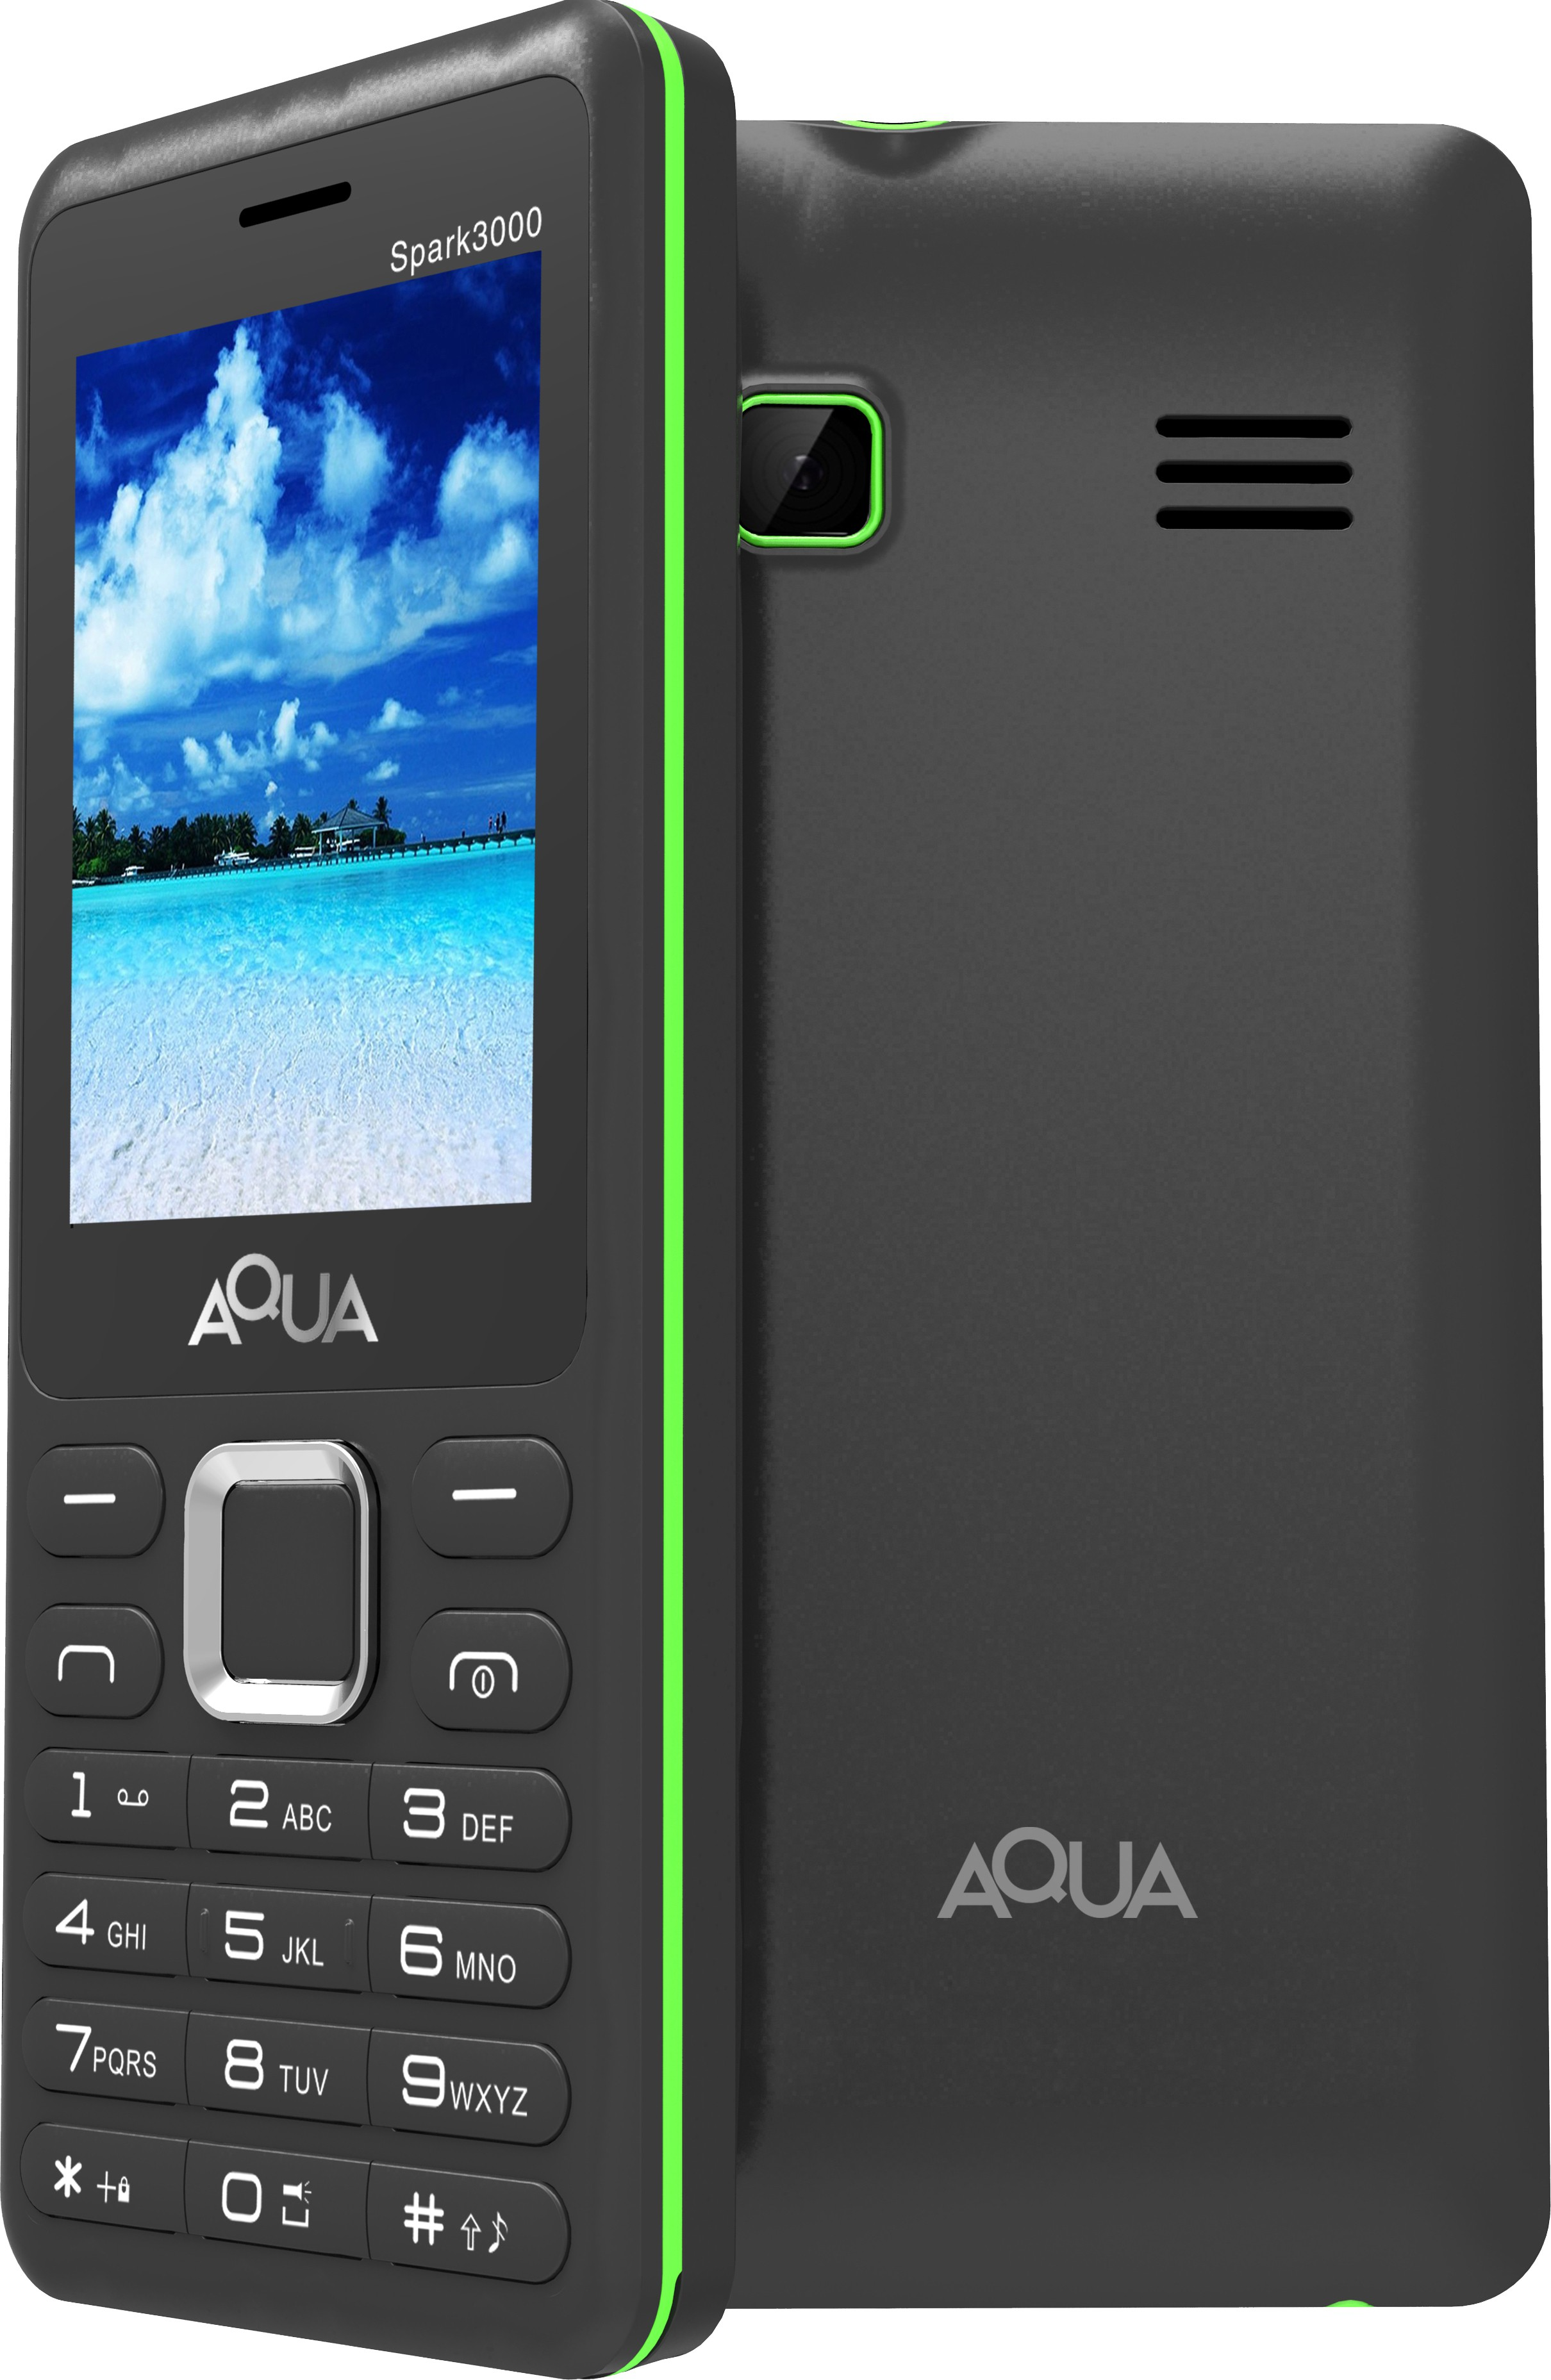 Aqua Spark 3000(Black)